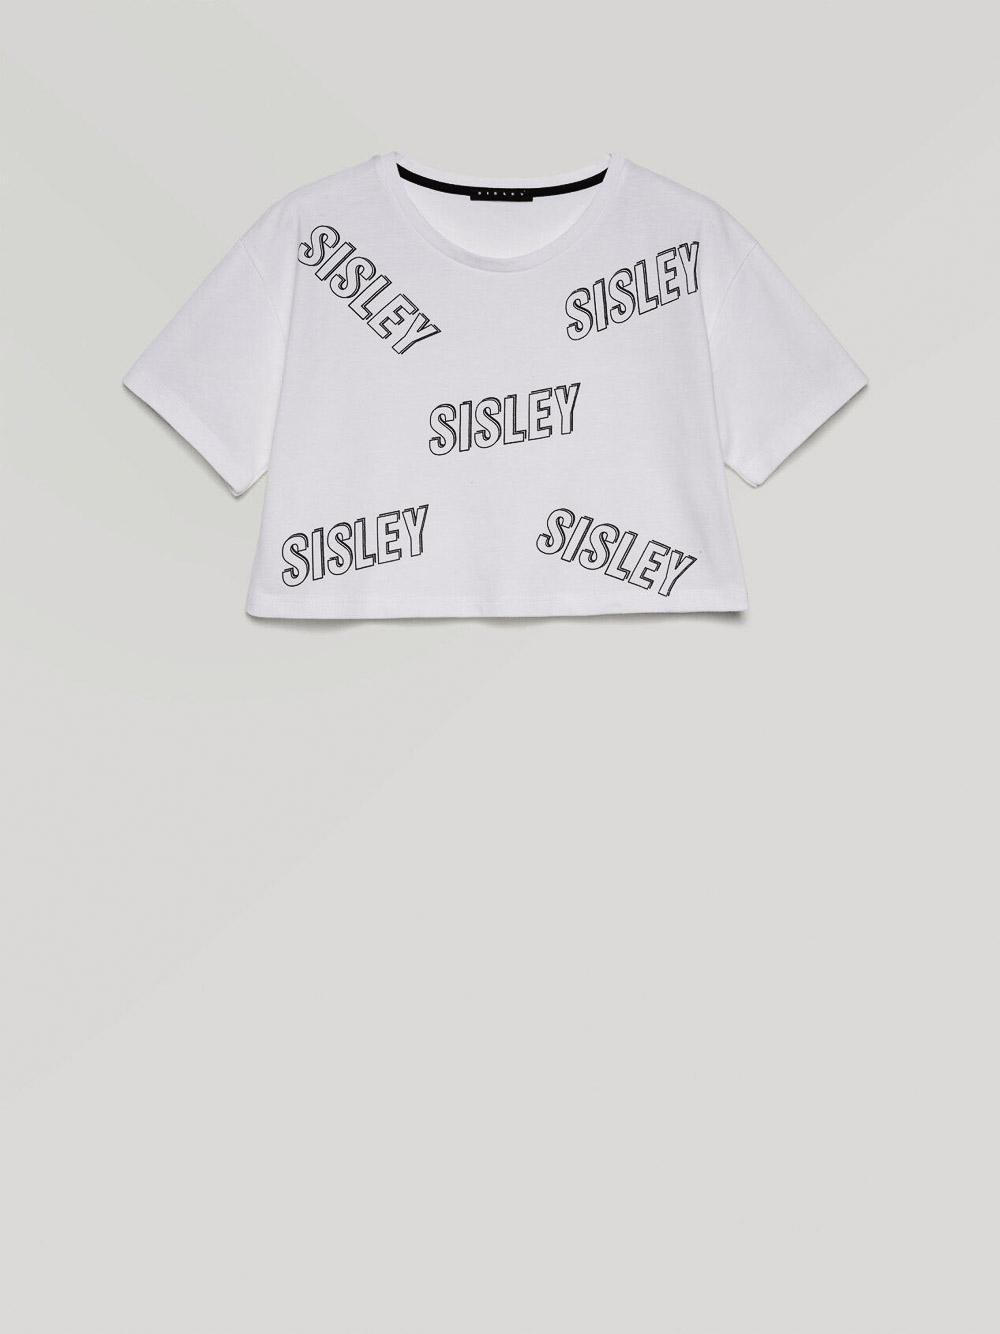 SISLEY YOUNG Μπλούζα t-shirt 3096C1599 21P101